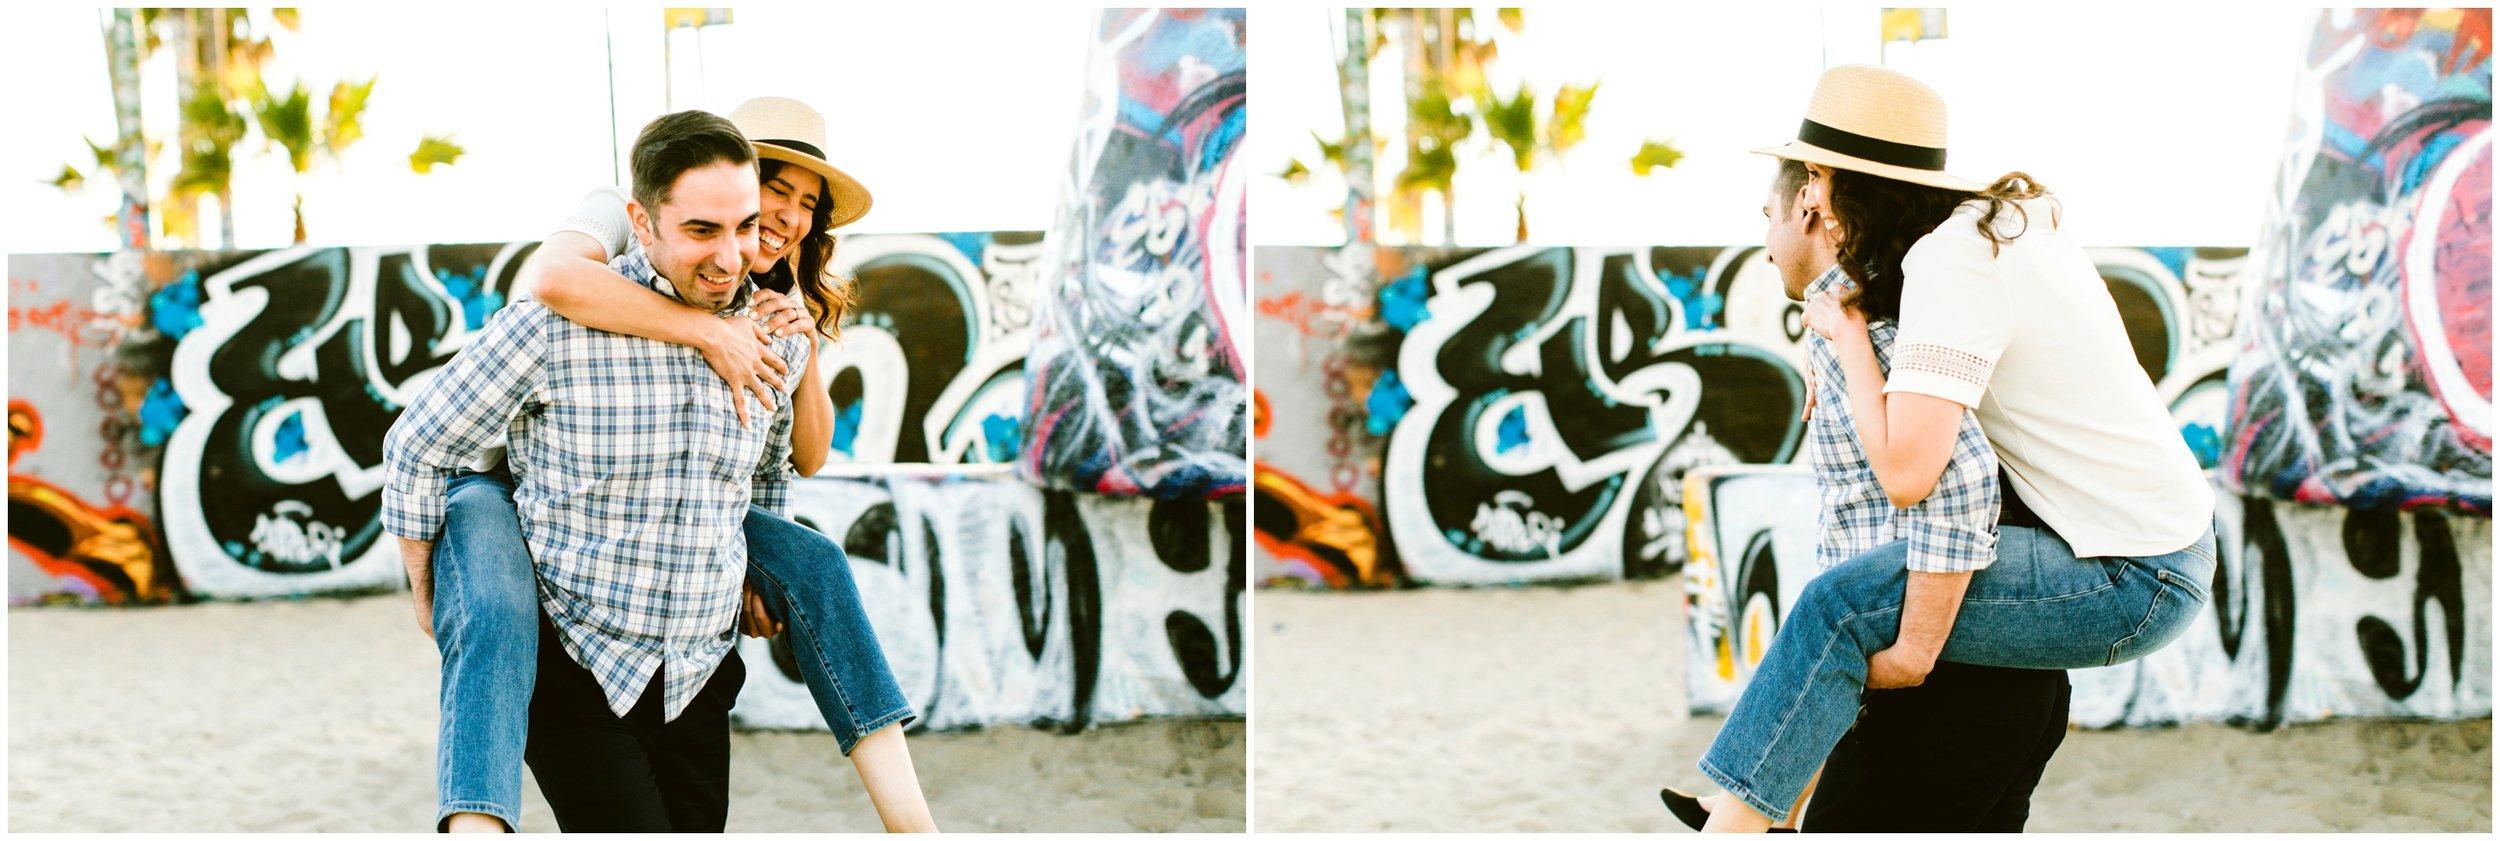 VeniceBeachCaliforniaEngagementPhotography_0017.jpg